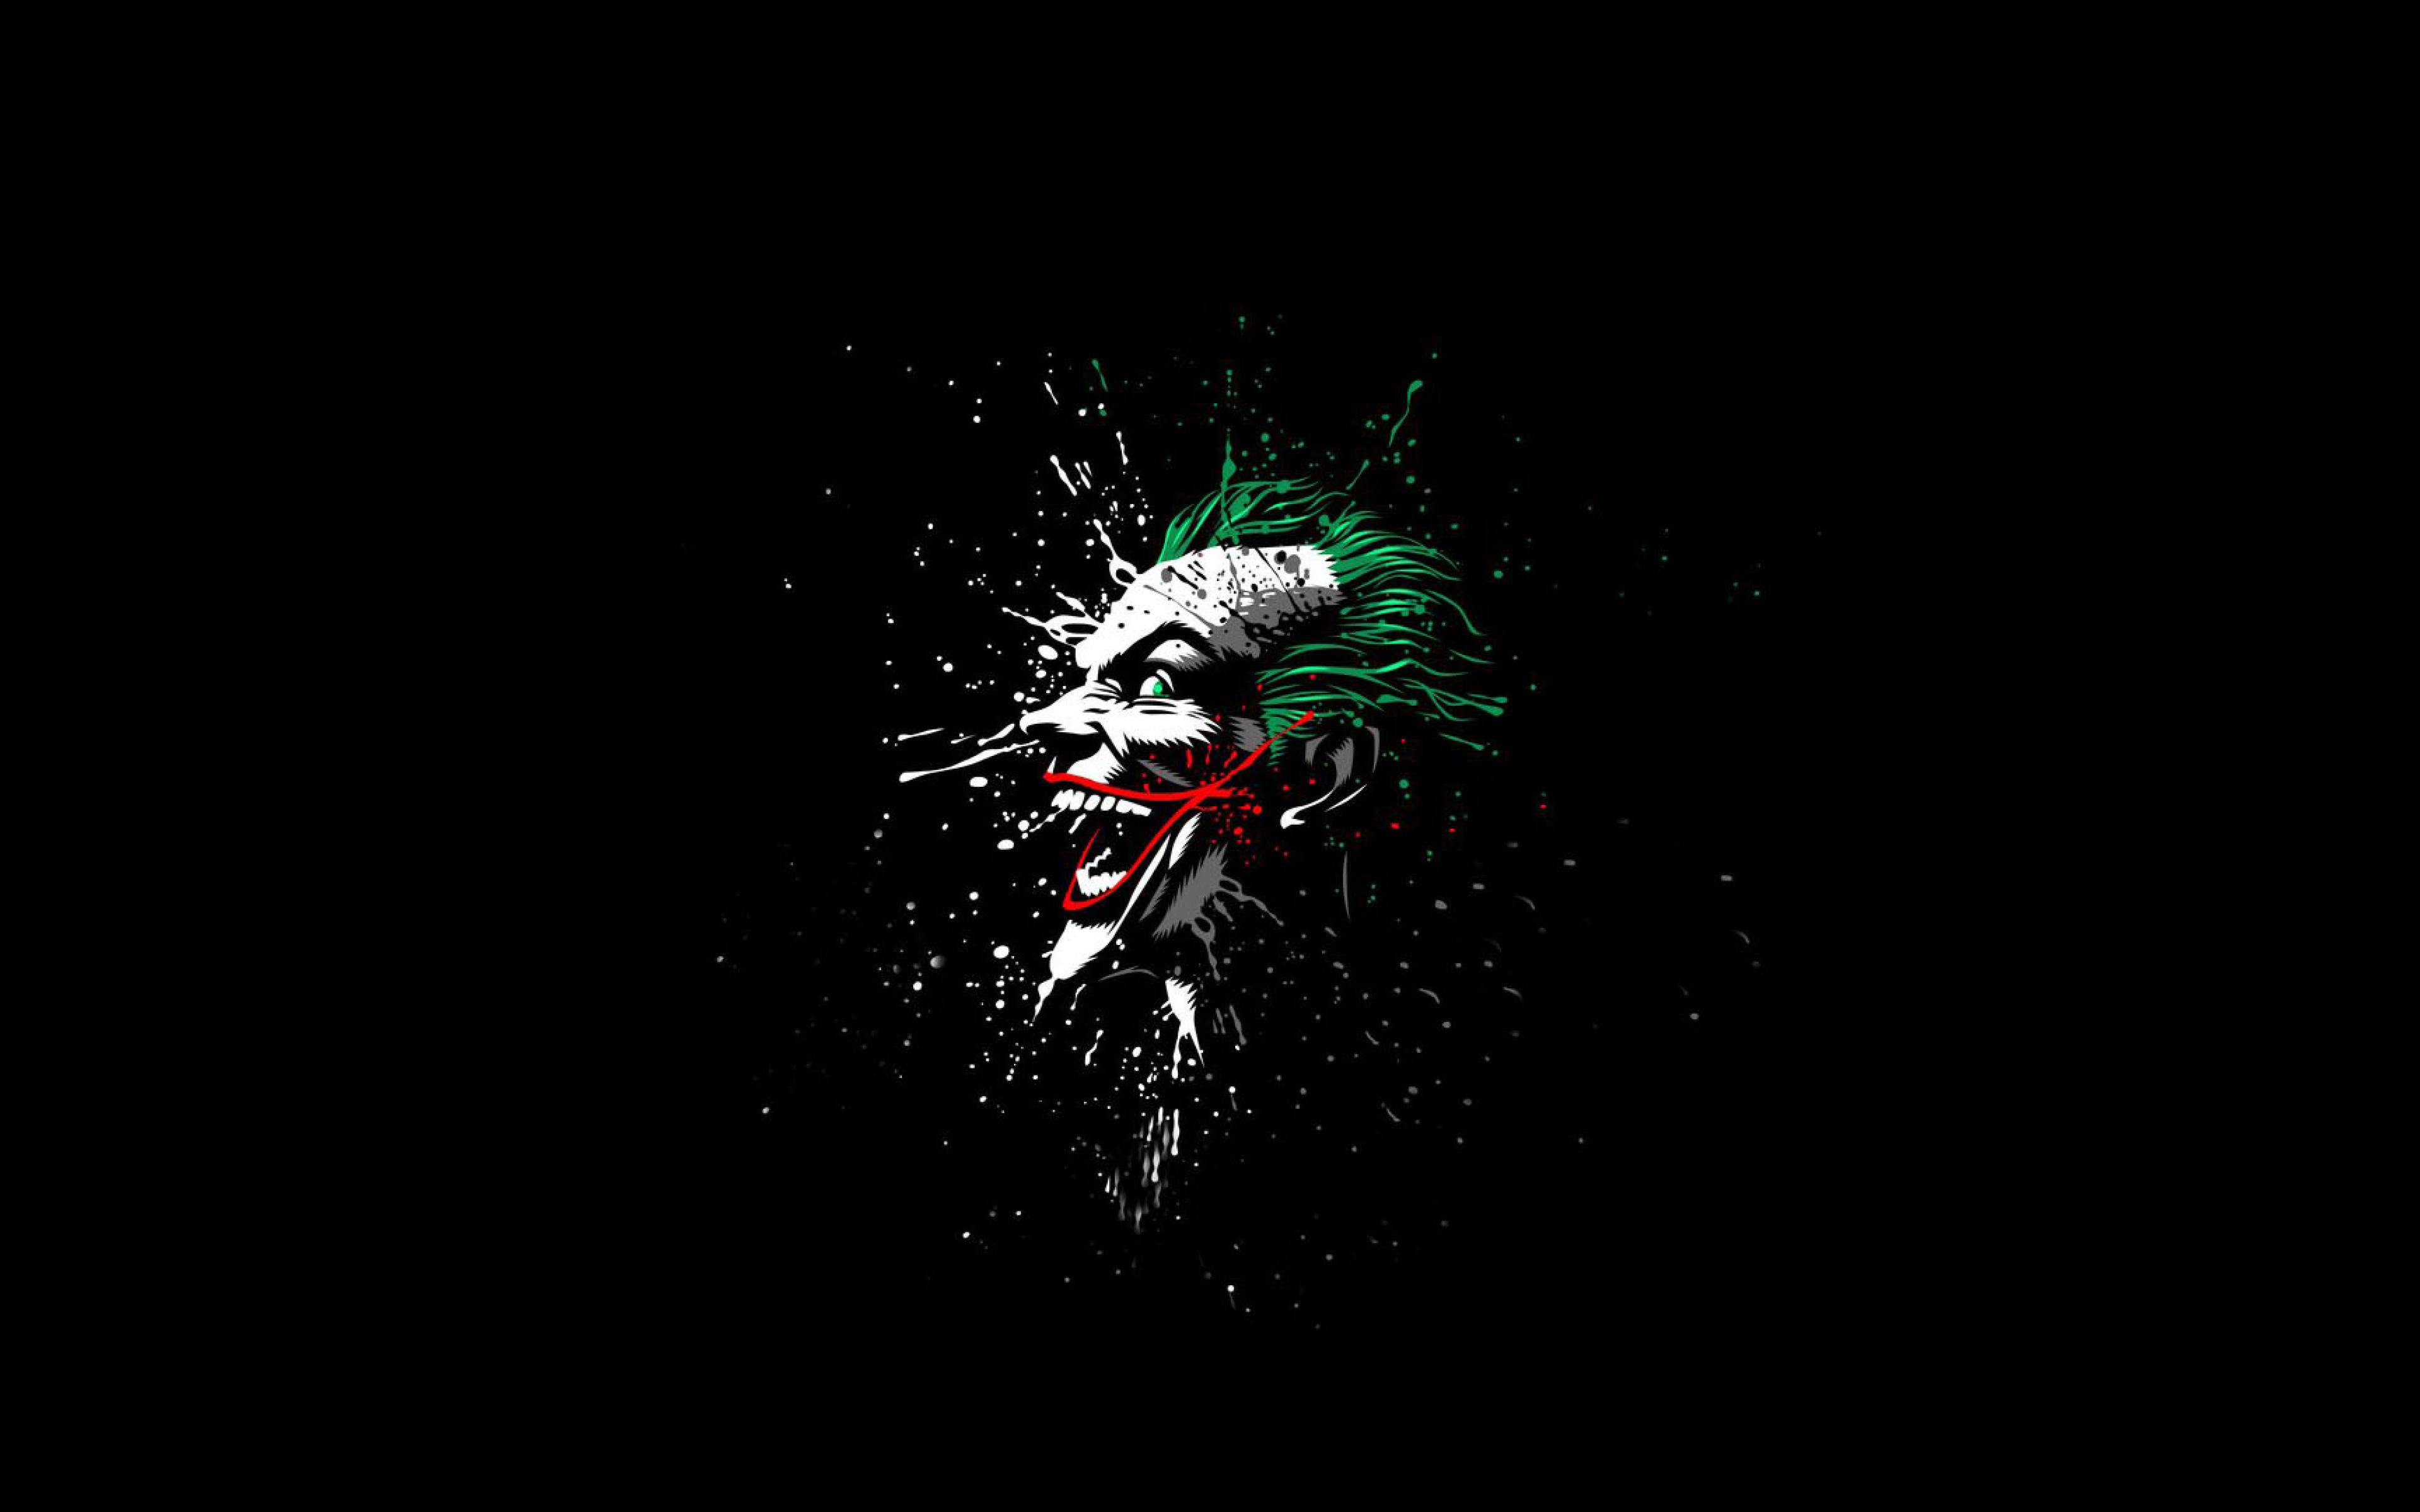 3840x2400 Joker Artwork Uhd 4k 3840x2400 Resolution Wallpaper Hd Artist 4k Wallpapers Images Photos And Background